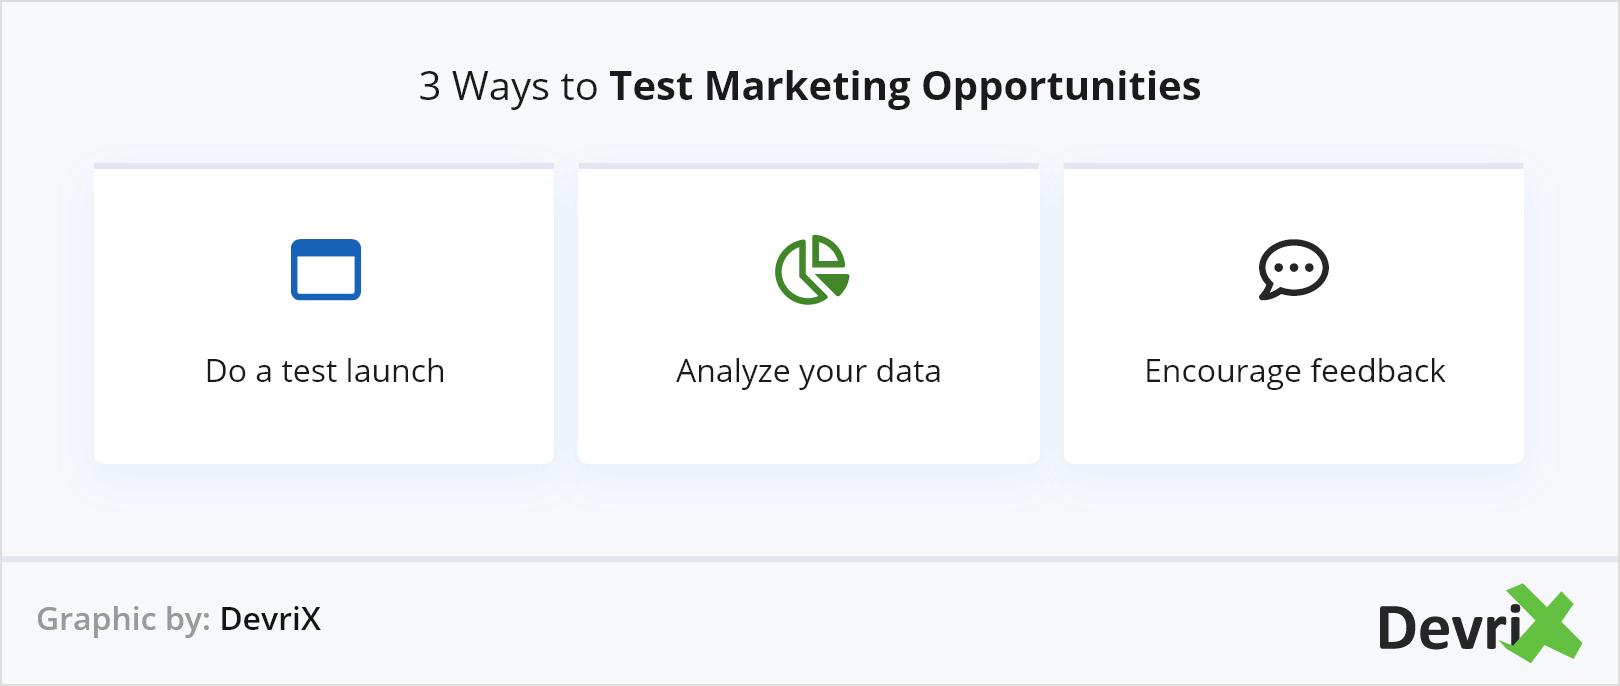 3 Ways to Test Marketing Opportunities@2x